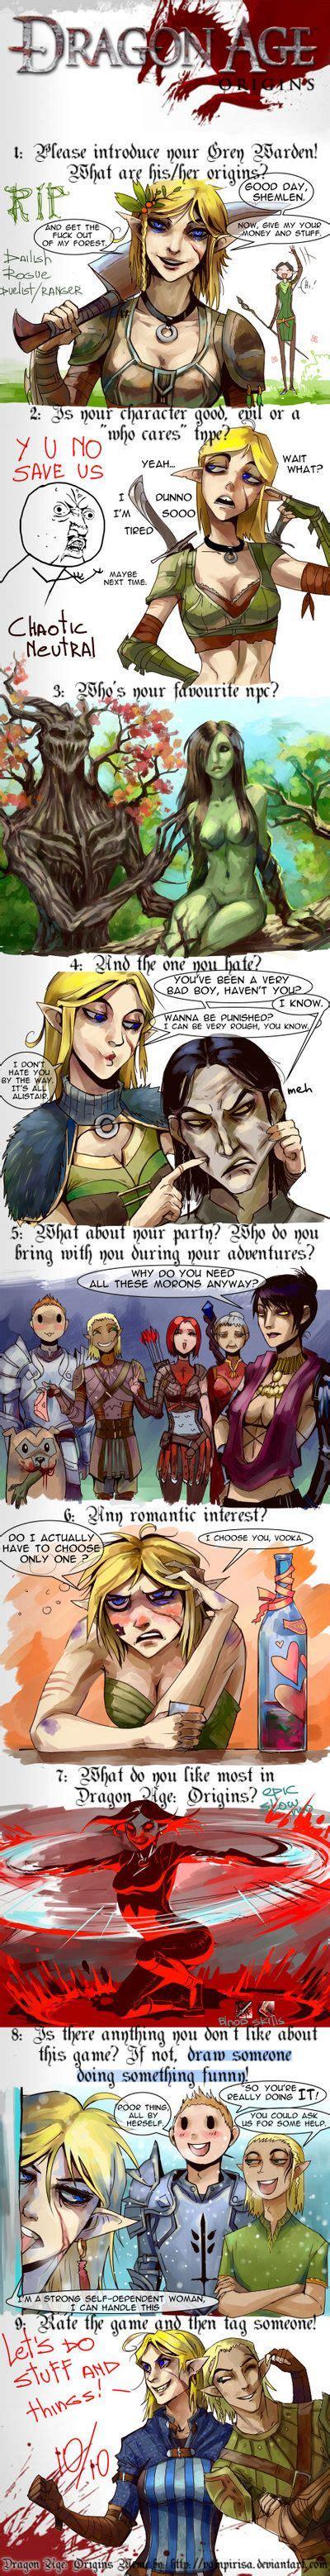 Dragon Age Kink Meme - dragon age origins meme by nanoetetsu deviantart com on deviantart nerdtopia pinterest